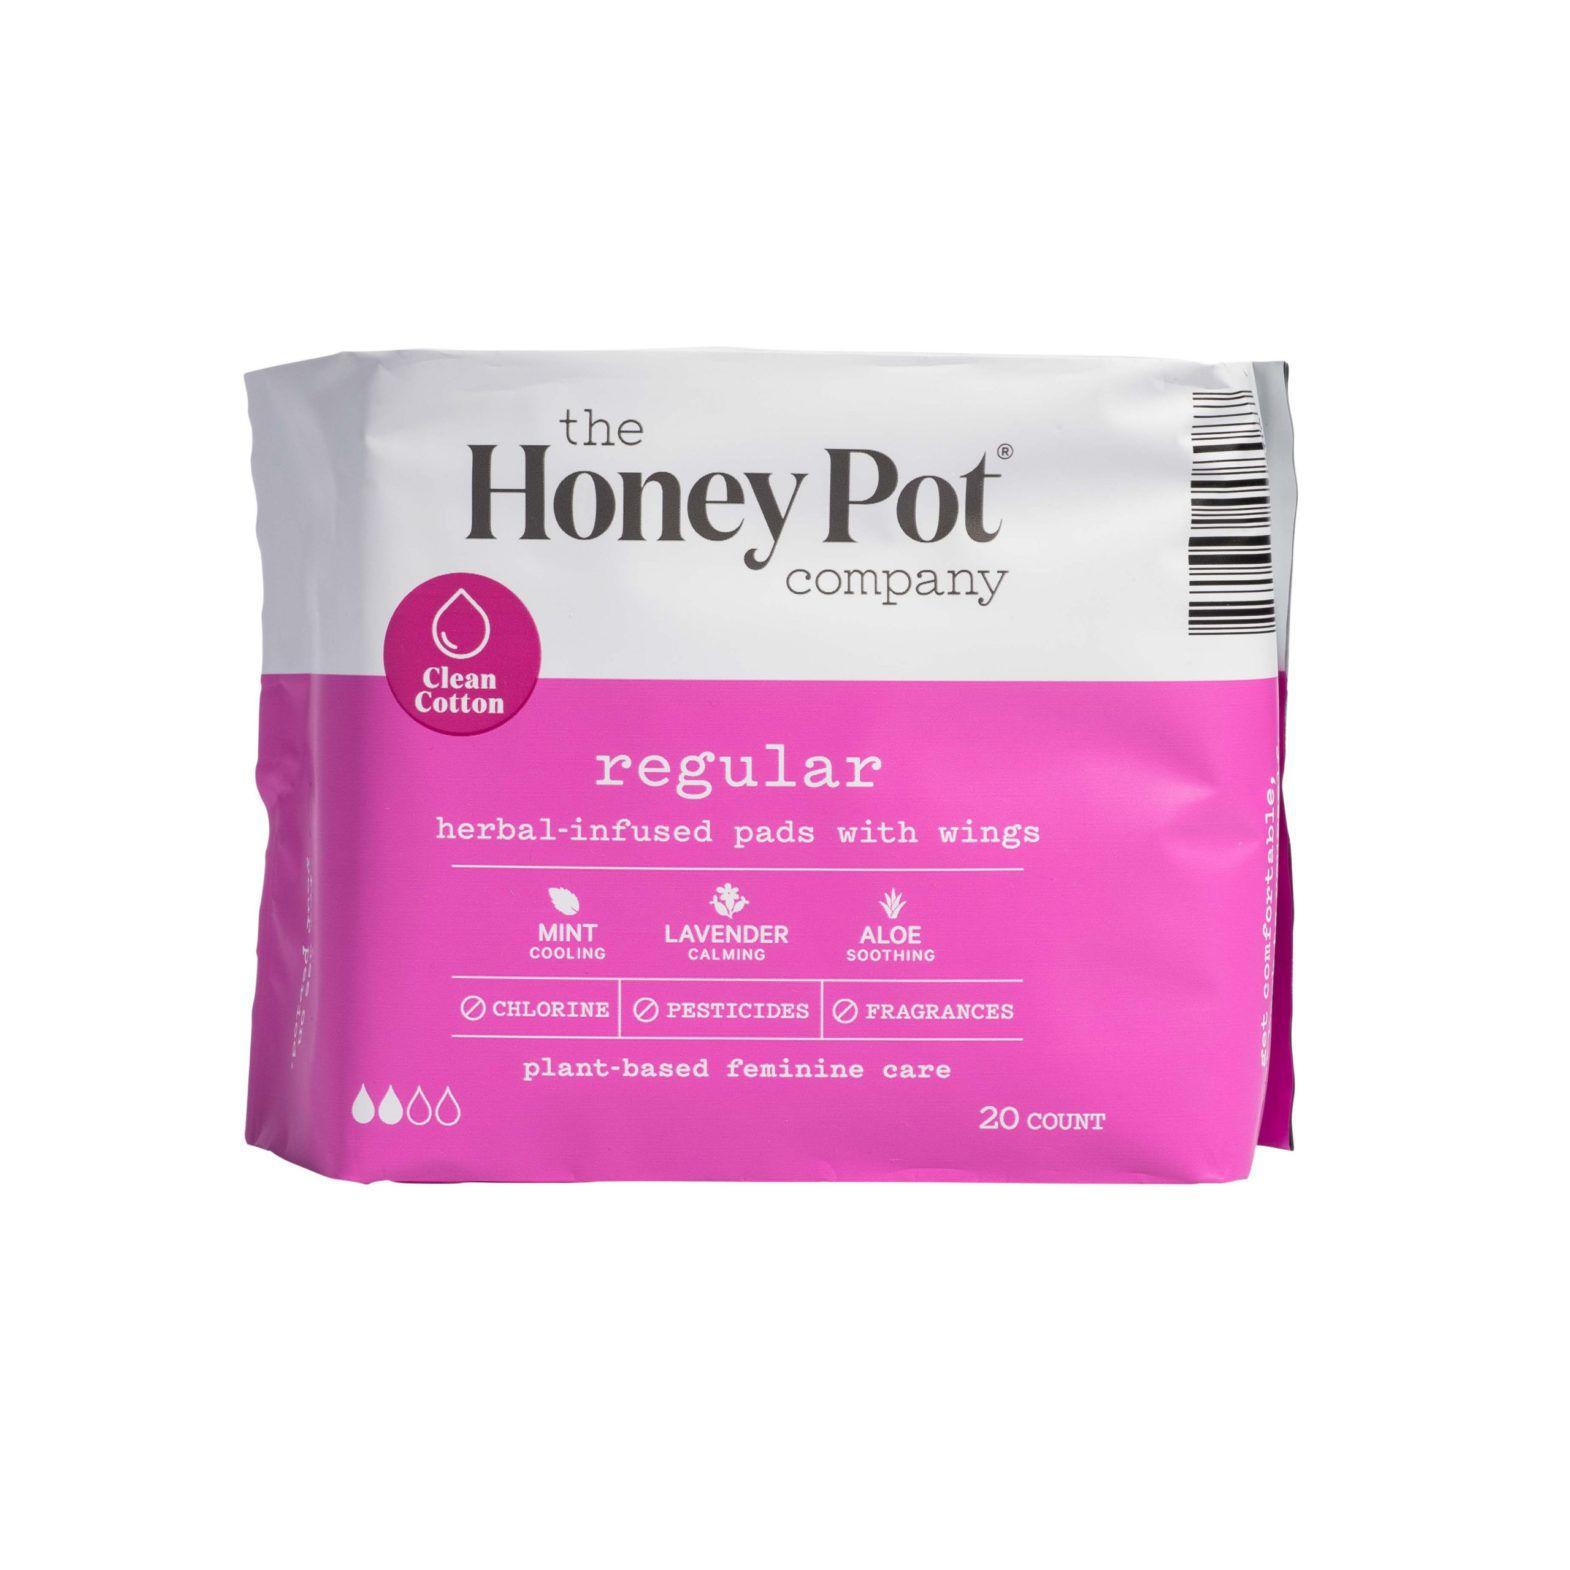 The Honey Pot Co Regular Herbal Pads